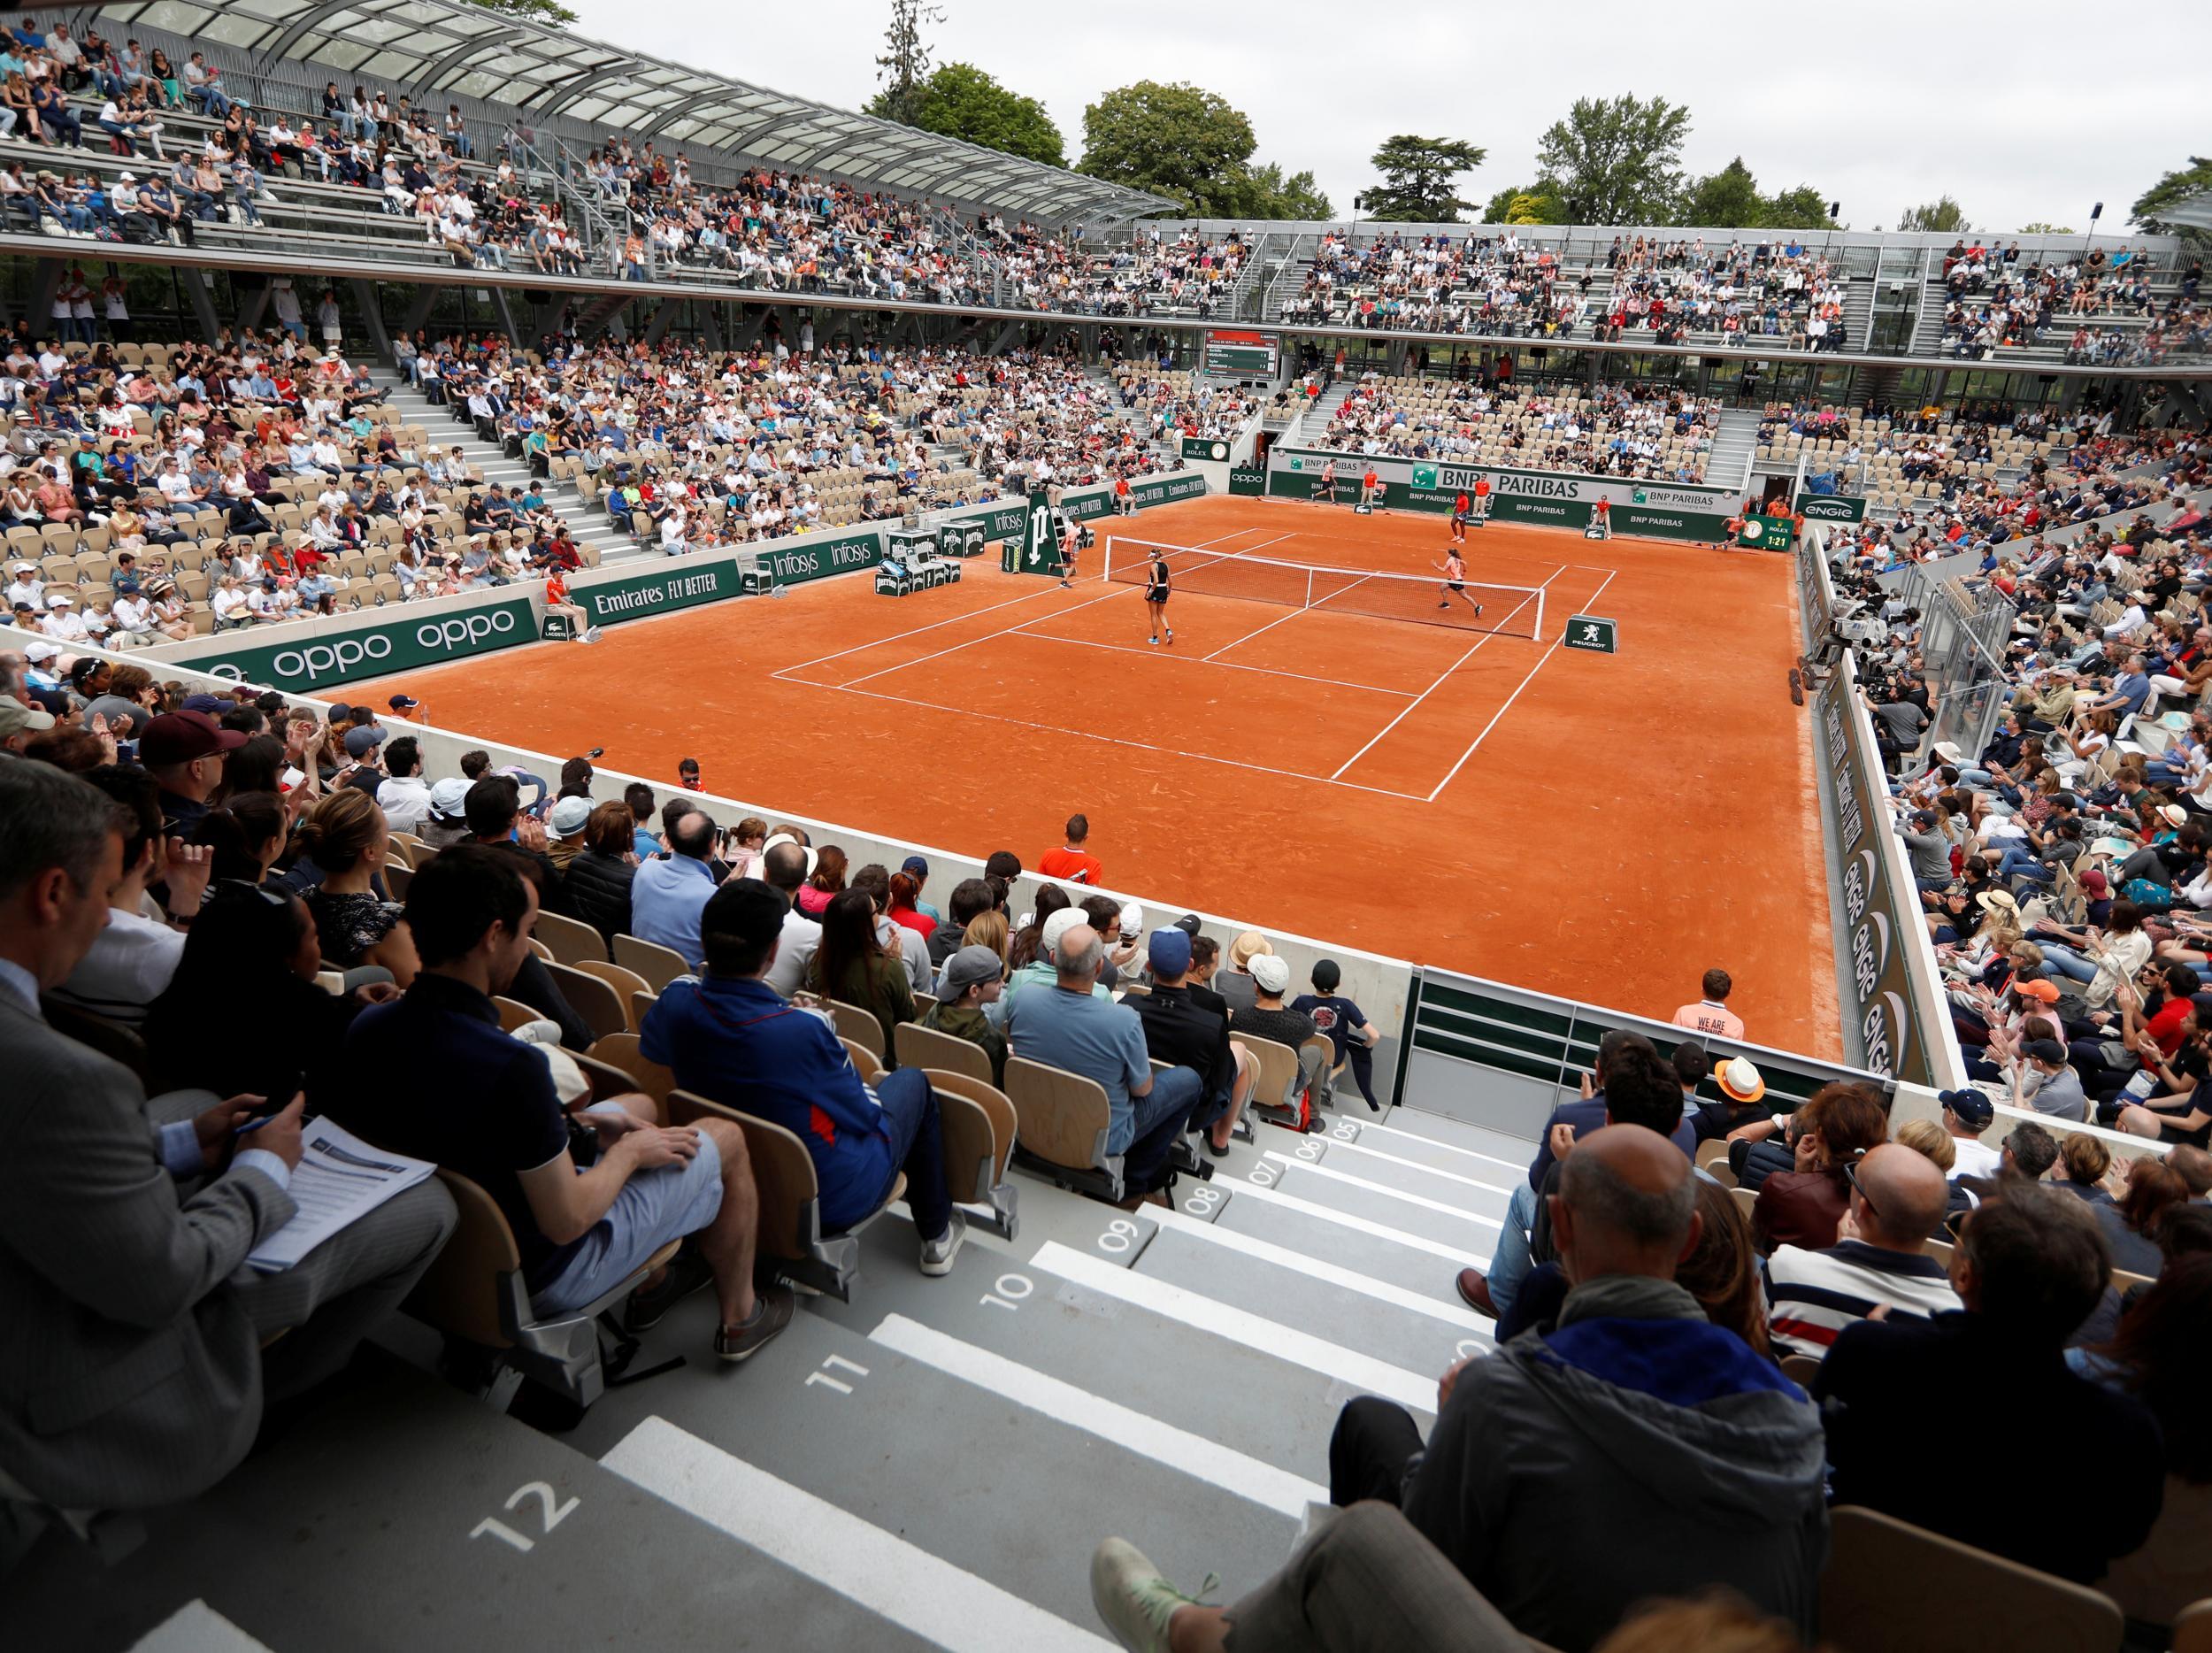 French Open 2019 Court Simonne Mathieu Stunning New